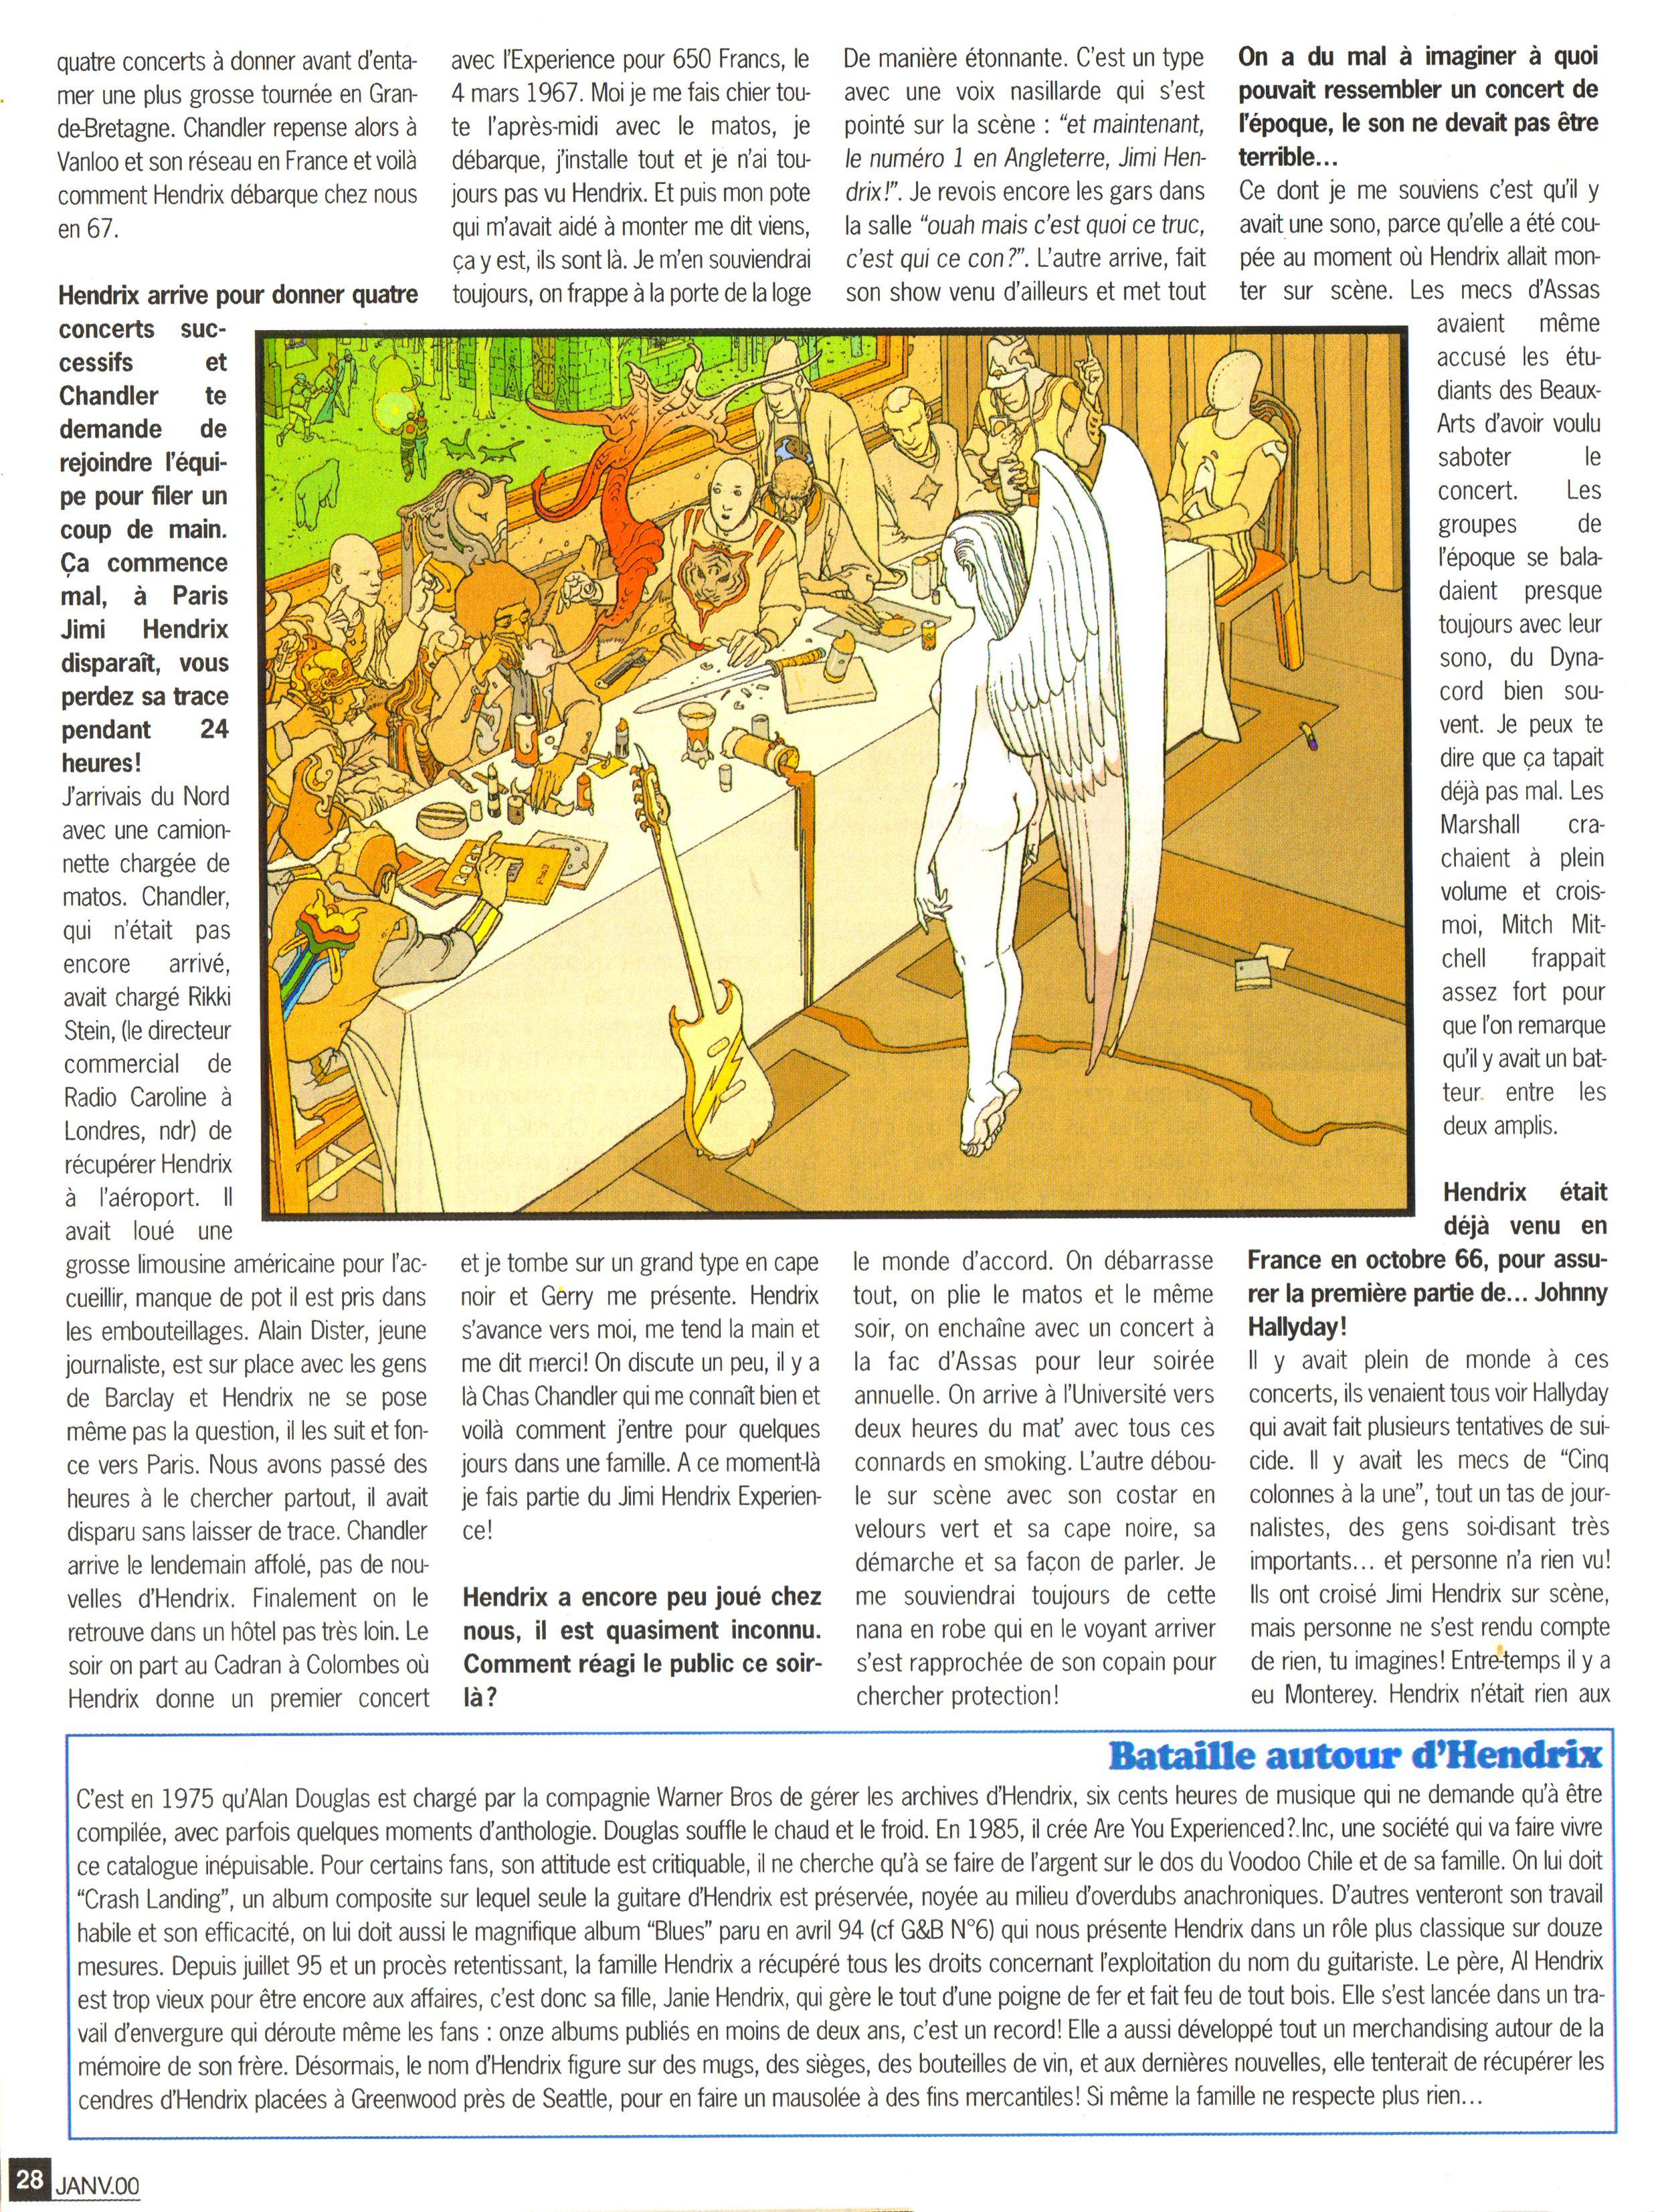 Magazines Français 1989 - 2014 GuitaretBassJanvier2000Page28